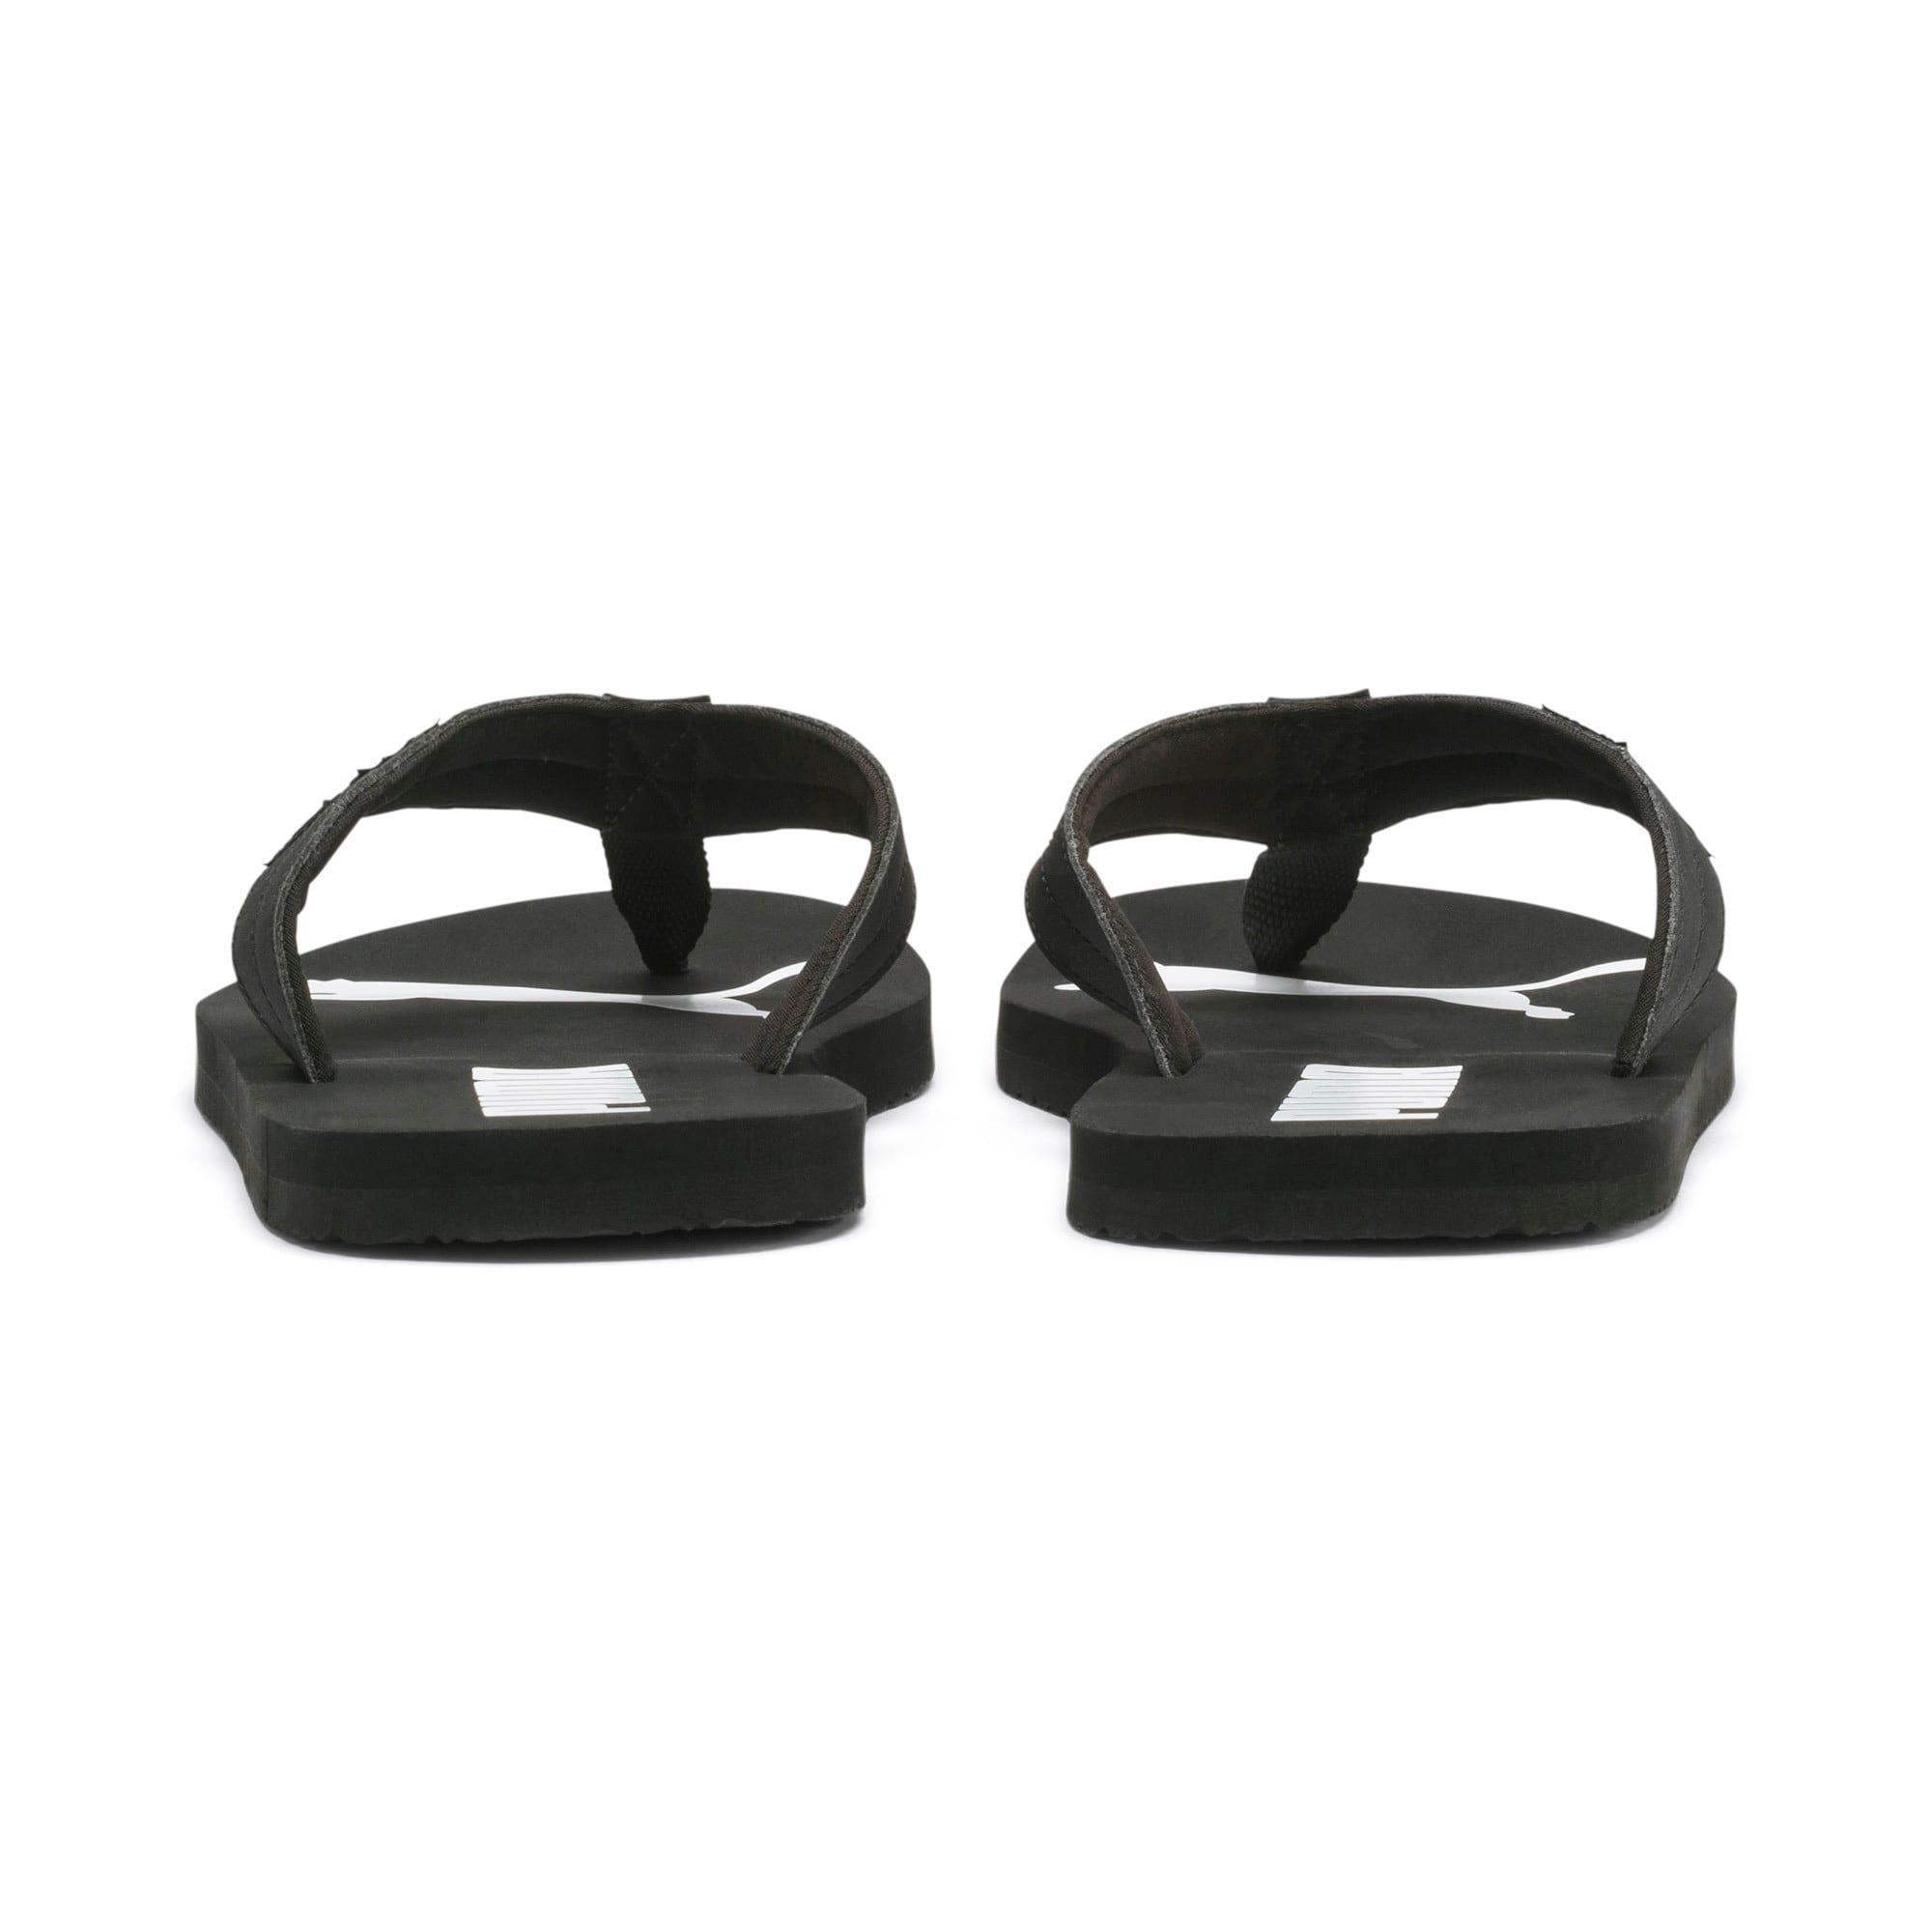 Thumbnail 3 of Cosy Flip Sandals, Puma Black-Puma White, medium